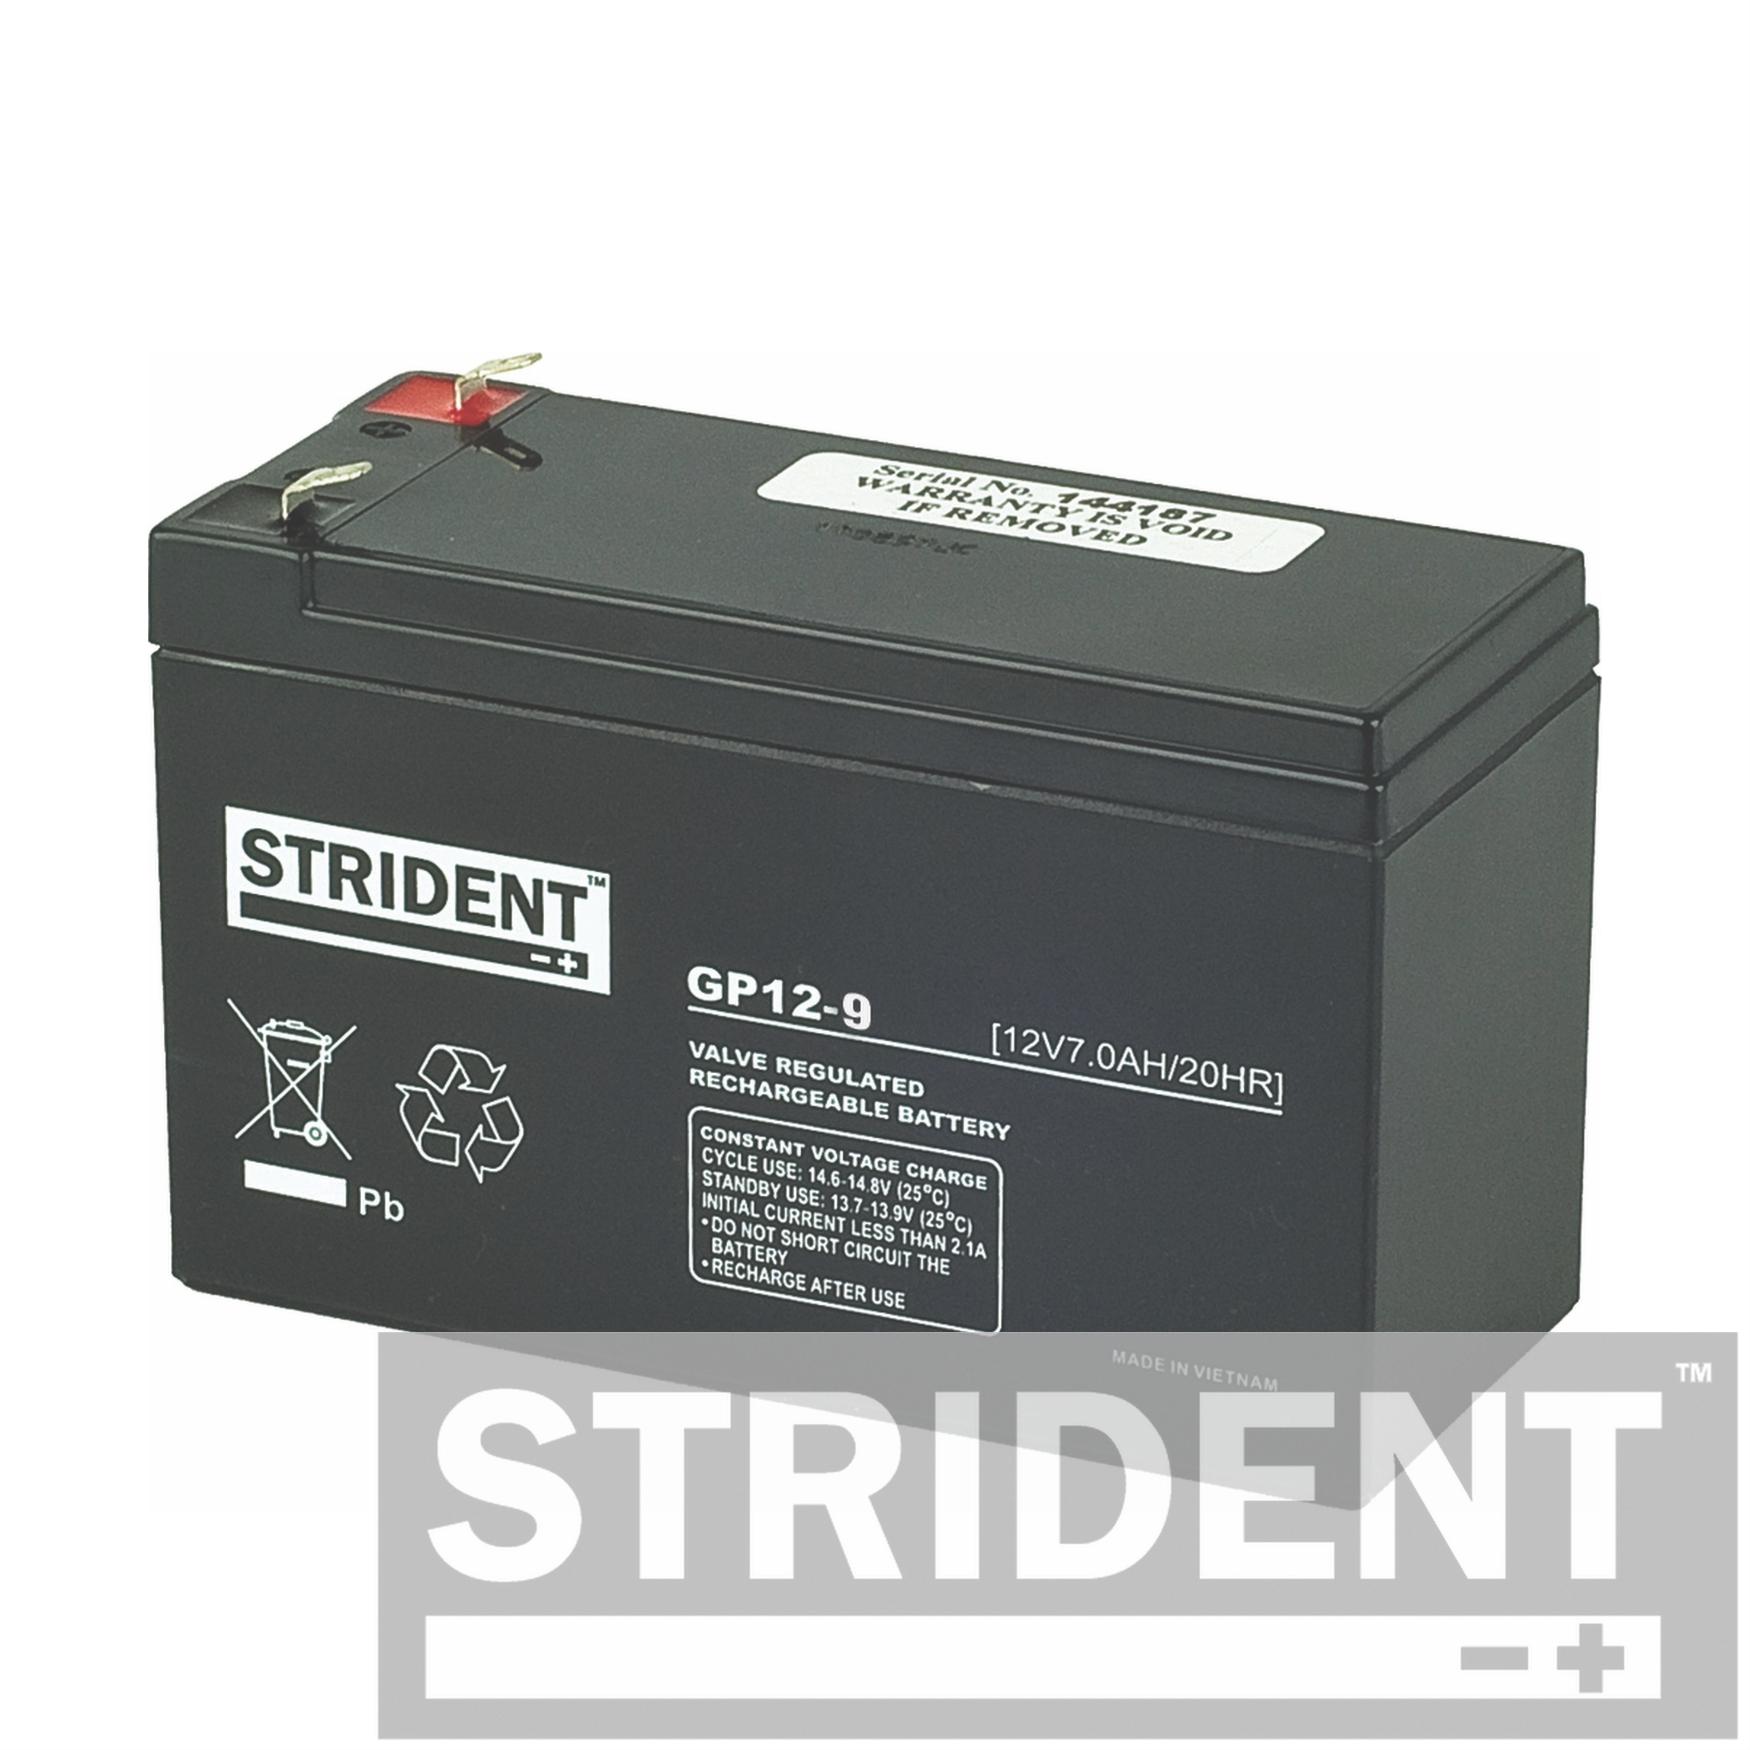 strident-agm-battery-gp12-9.jpg